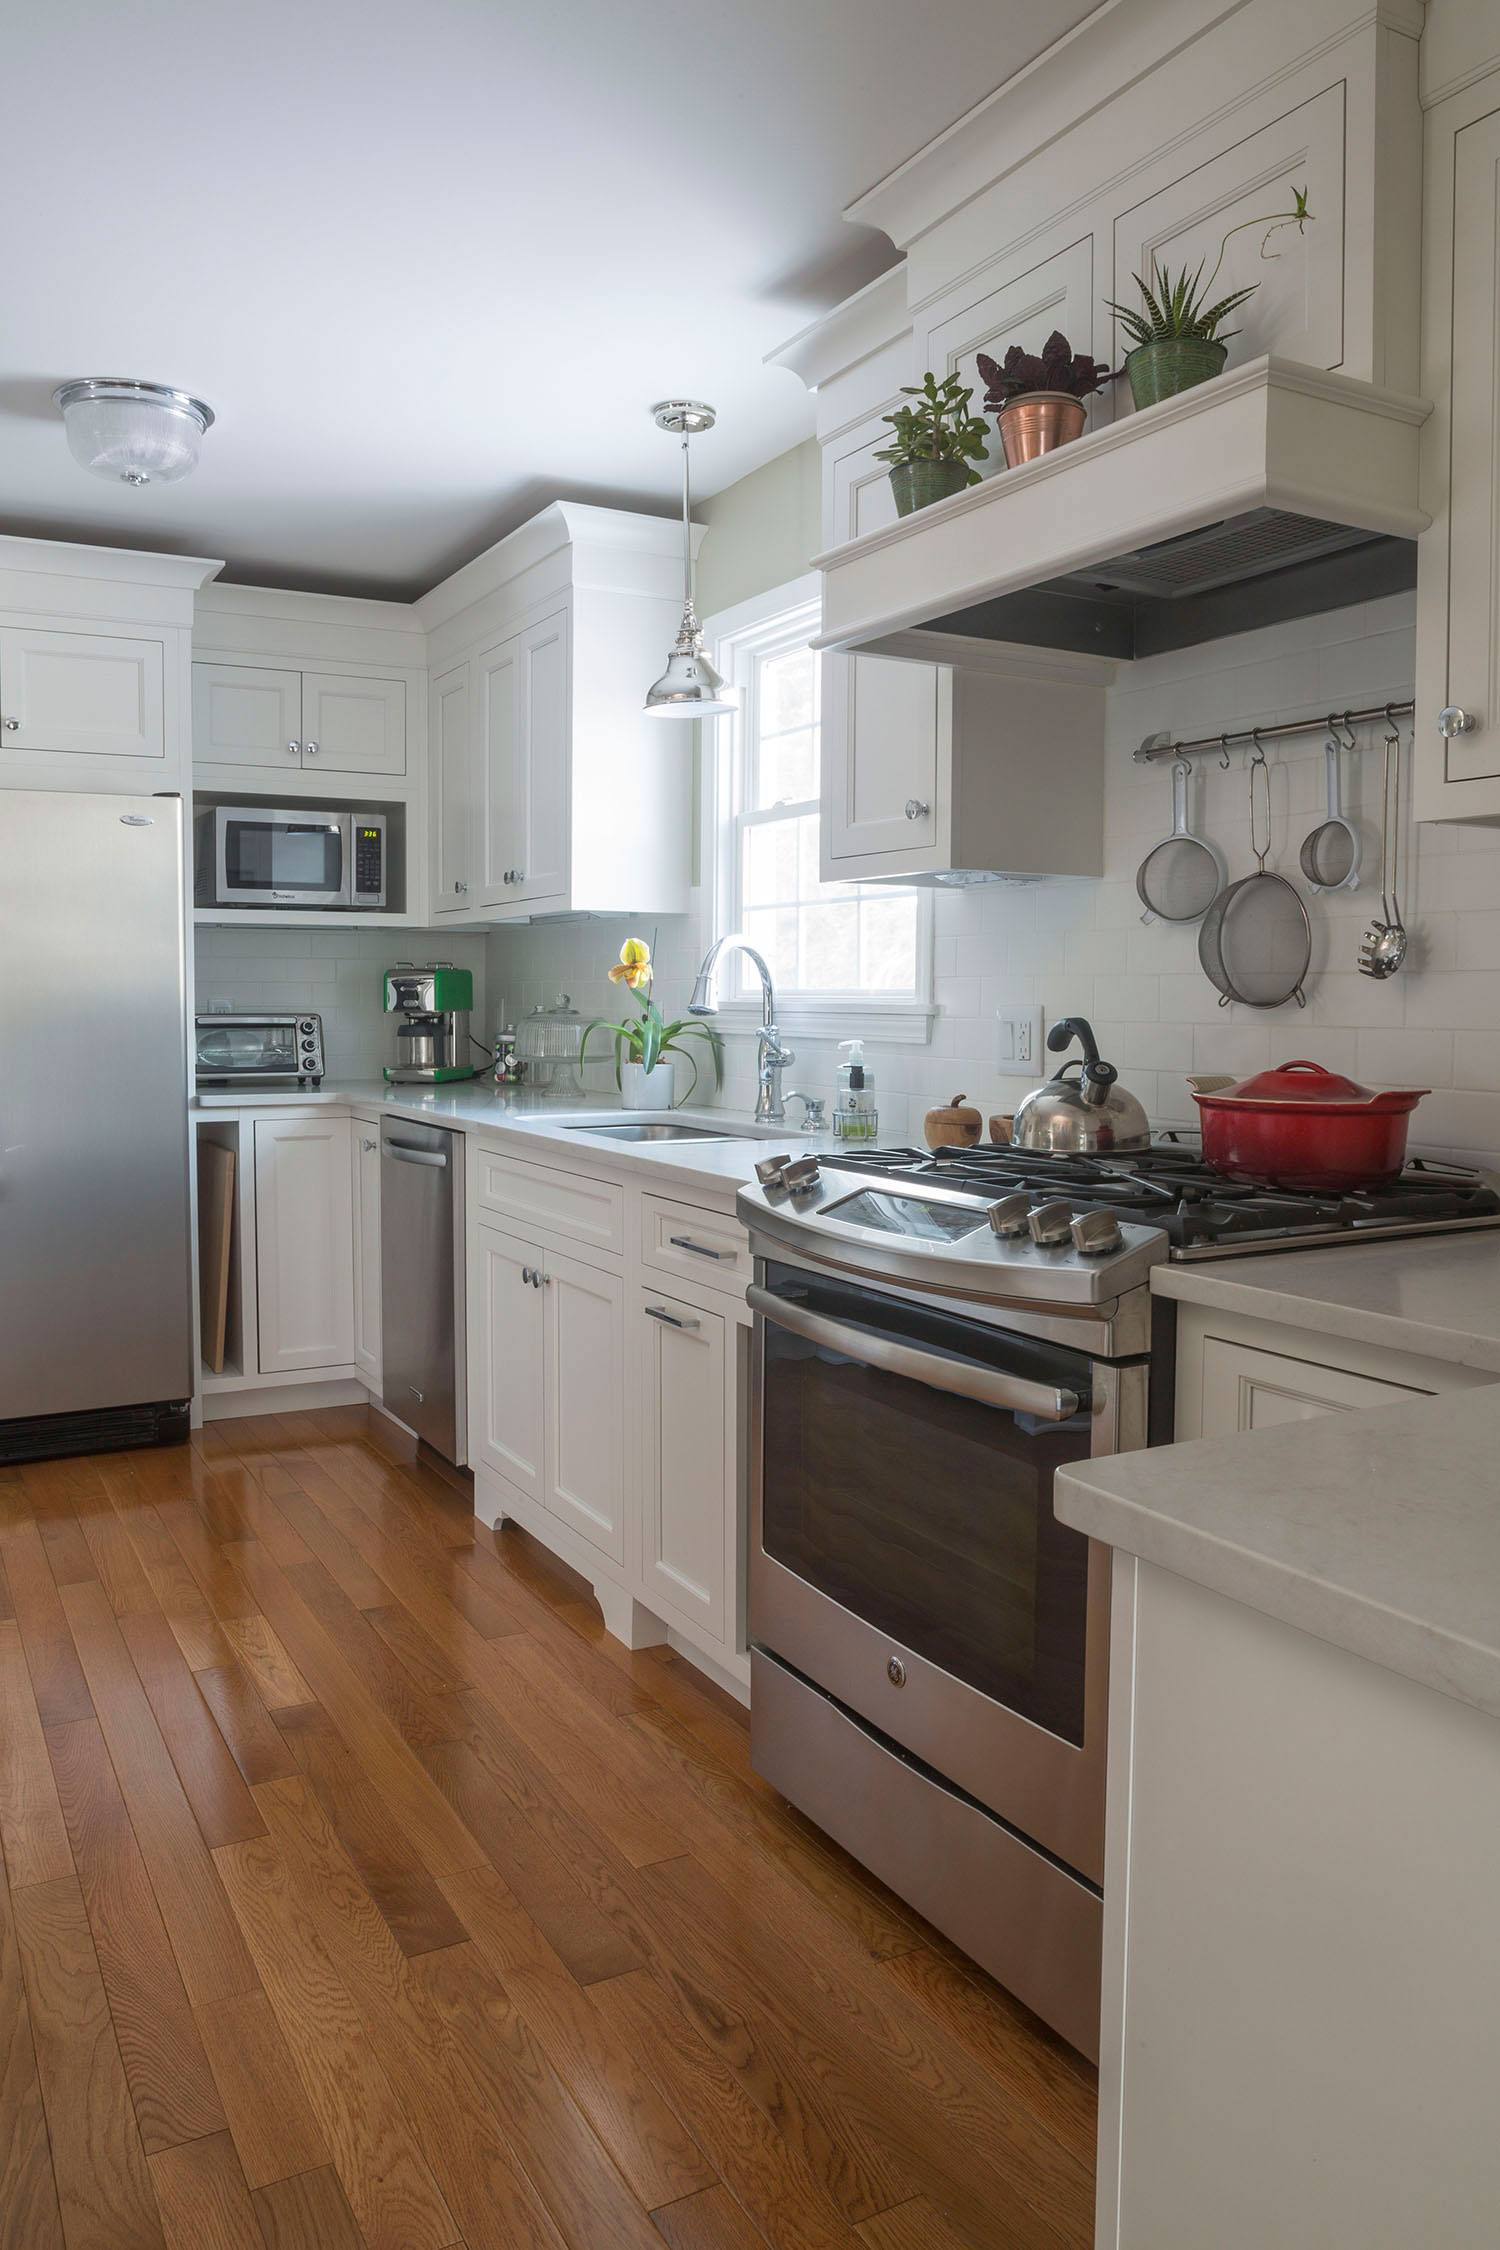 classic-ivory-kitchen-stovetop-sink.jpg